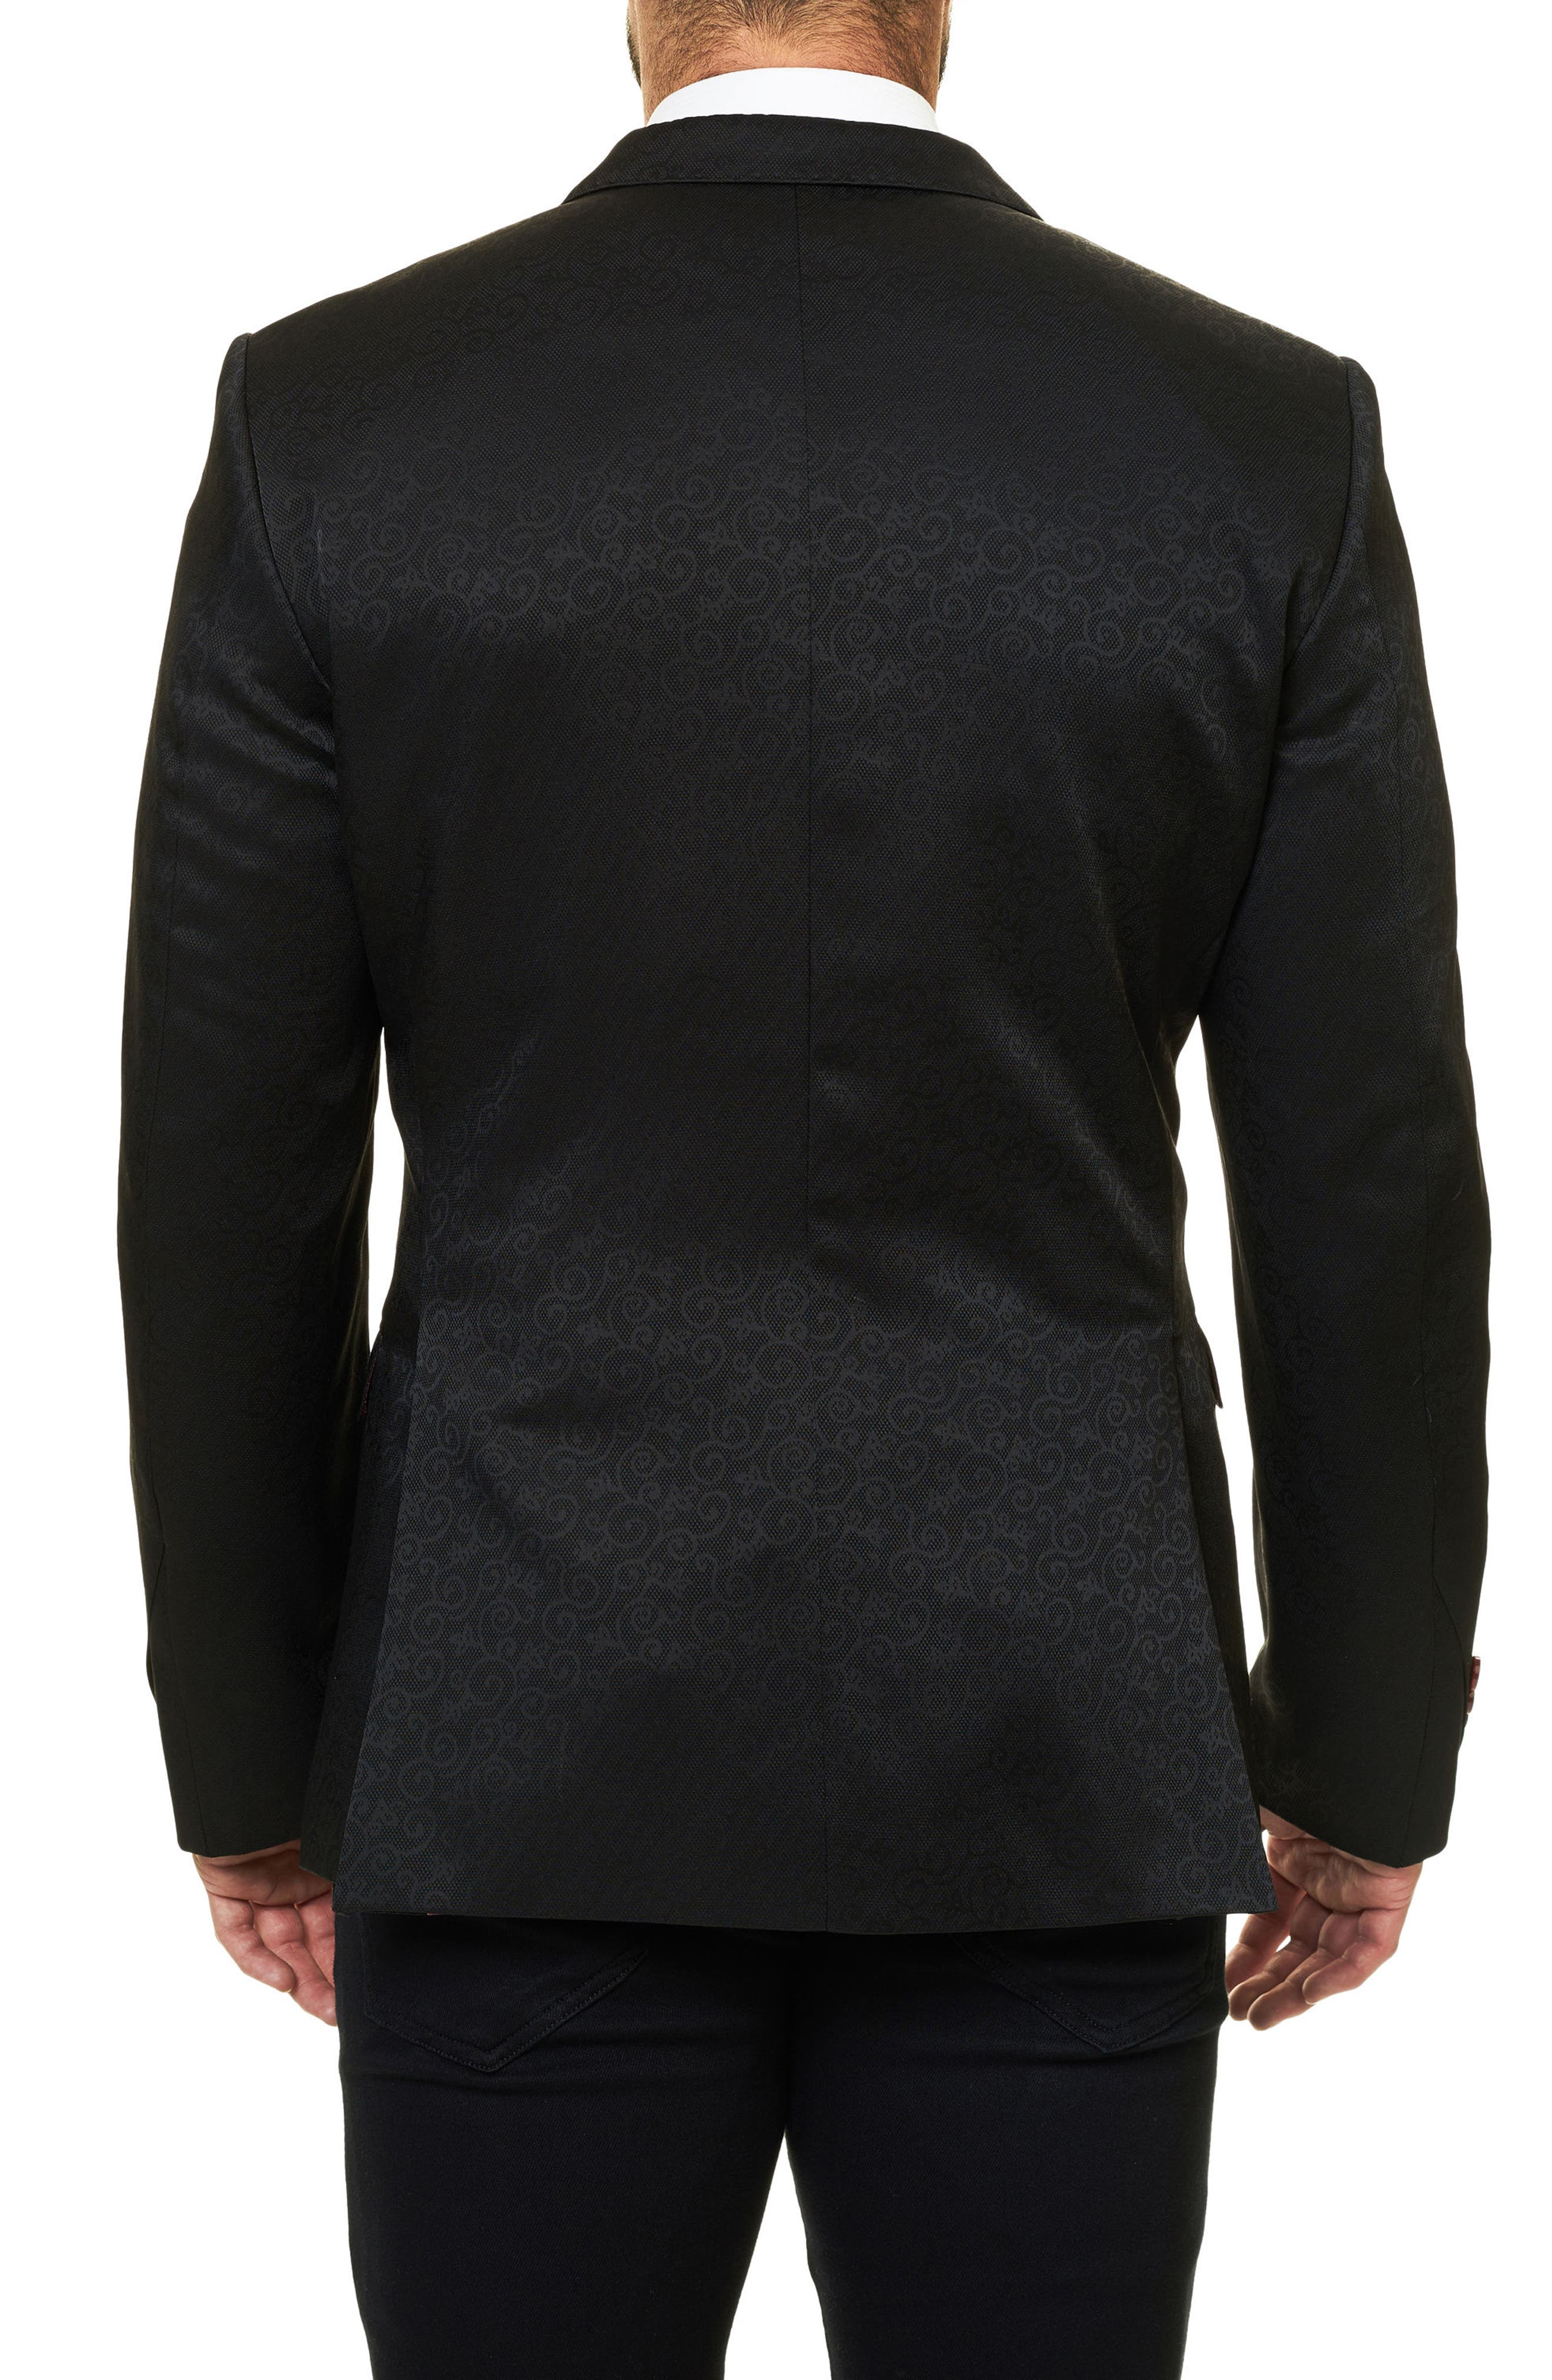 Descartes Jacquard Sport Coat,                             Alternate thumbnail 2, color,                             Solid Black